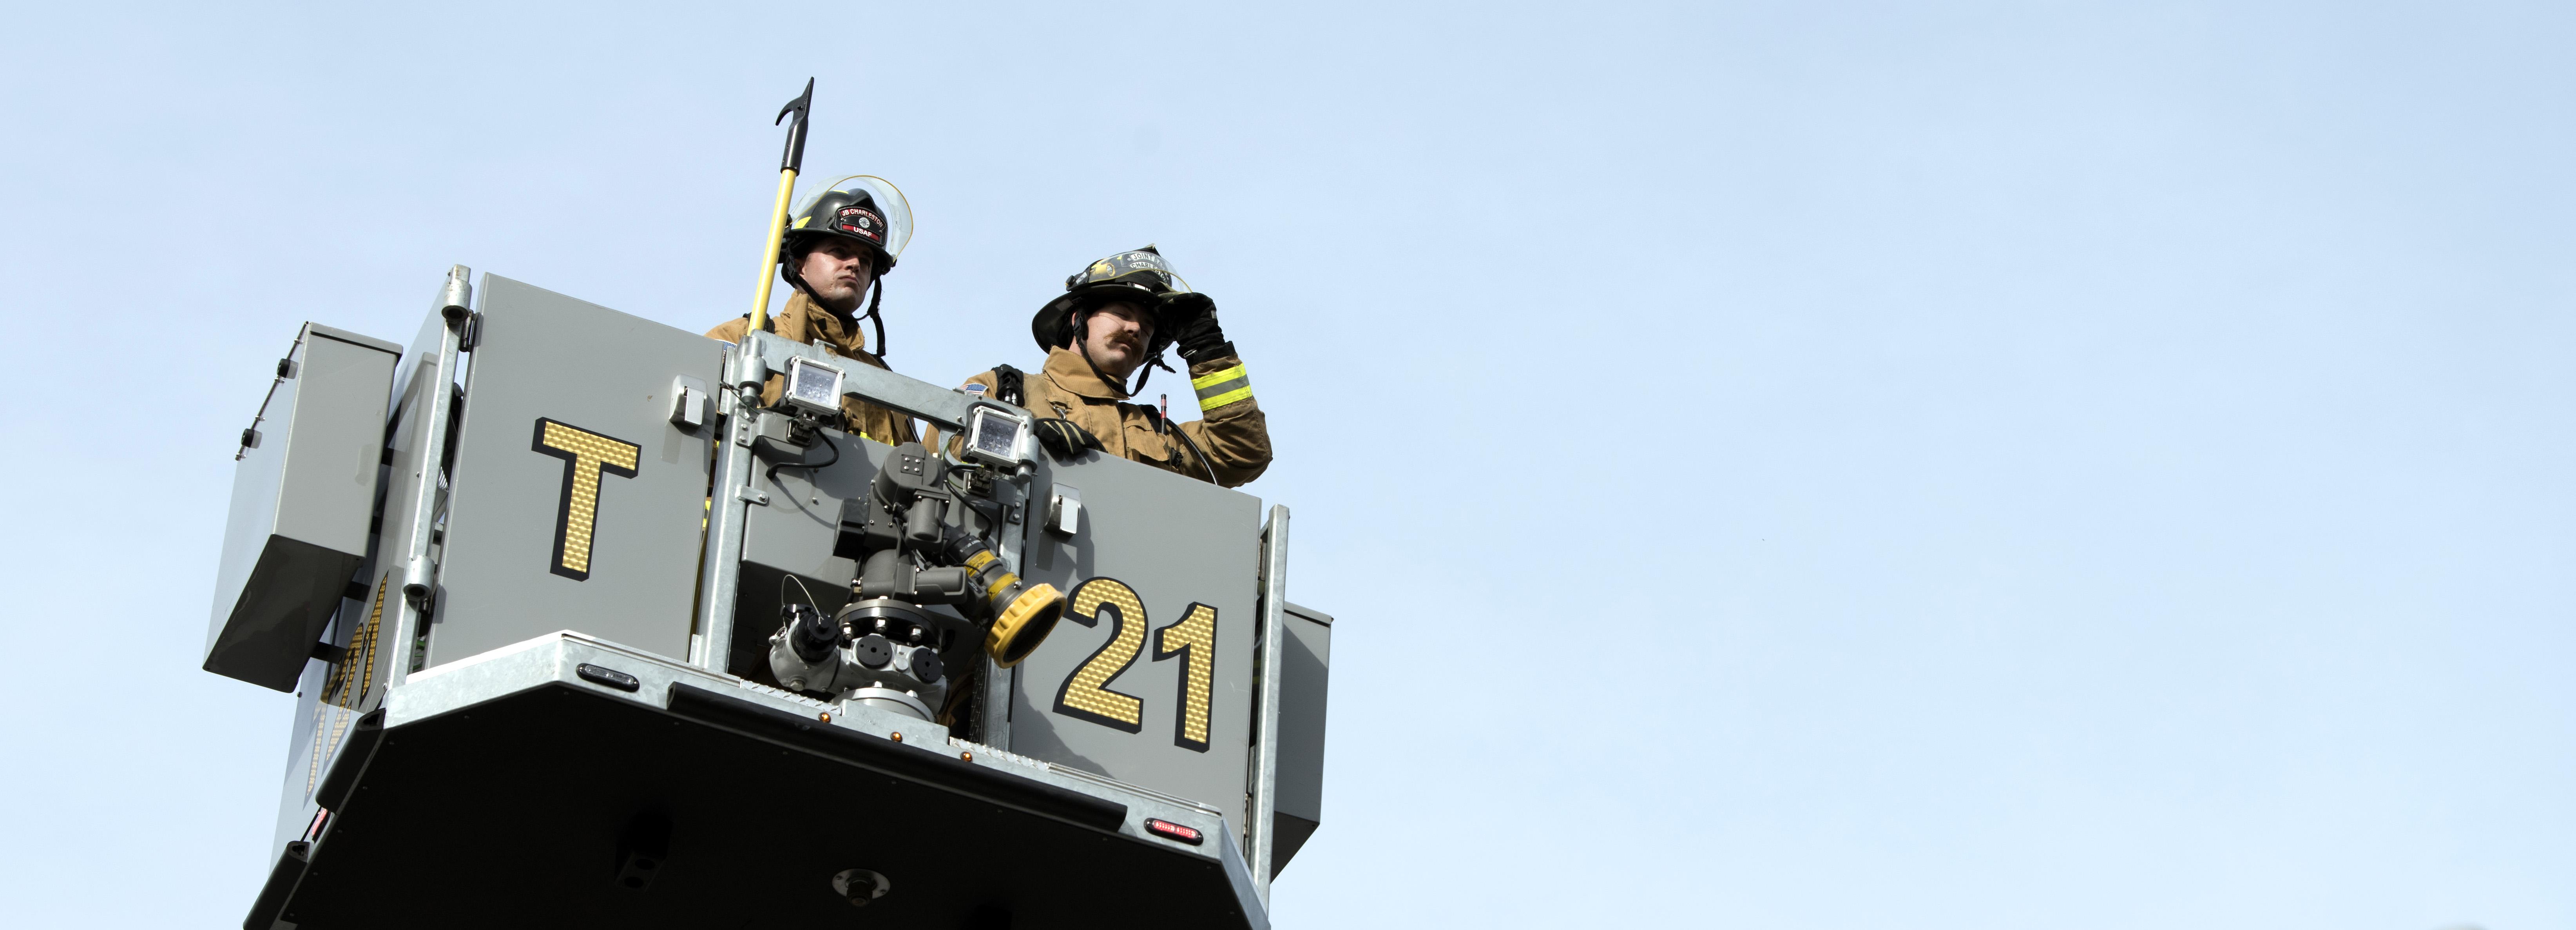 Regardless of the uniform we wear: 628th CES Fire Department